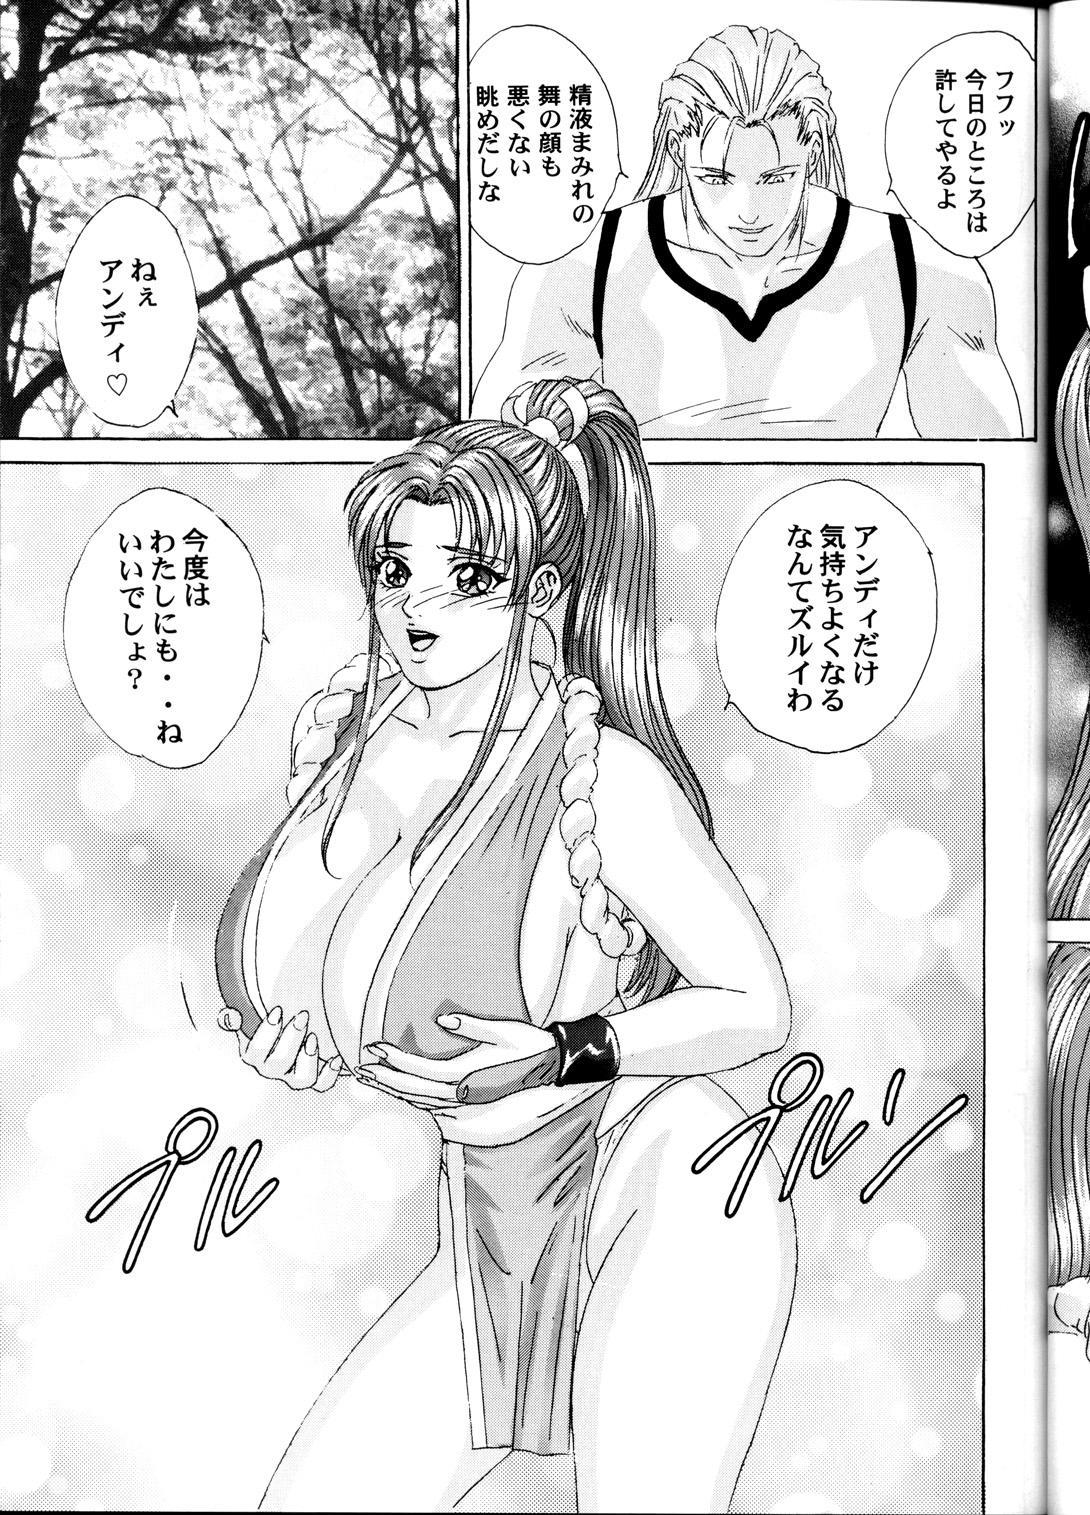 (C60) [D-LOVERS (Nishimaki Tohru)] Mai -Innyuuden- Daiichigou (King of Fighters) 13